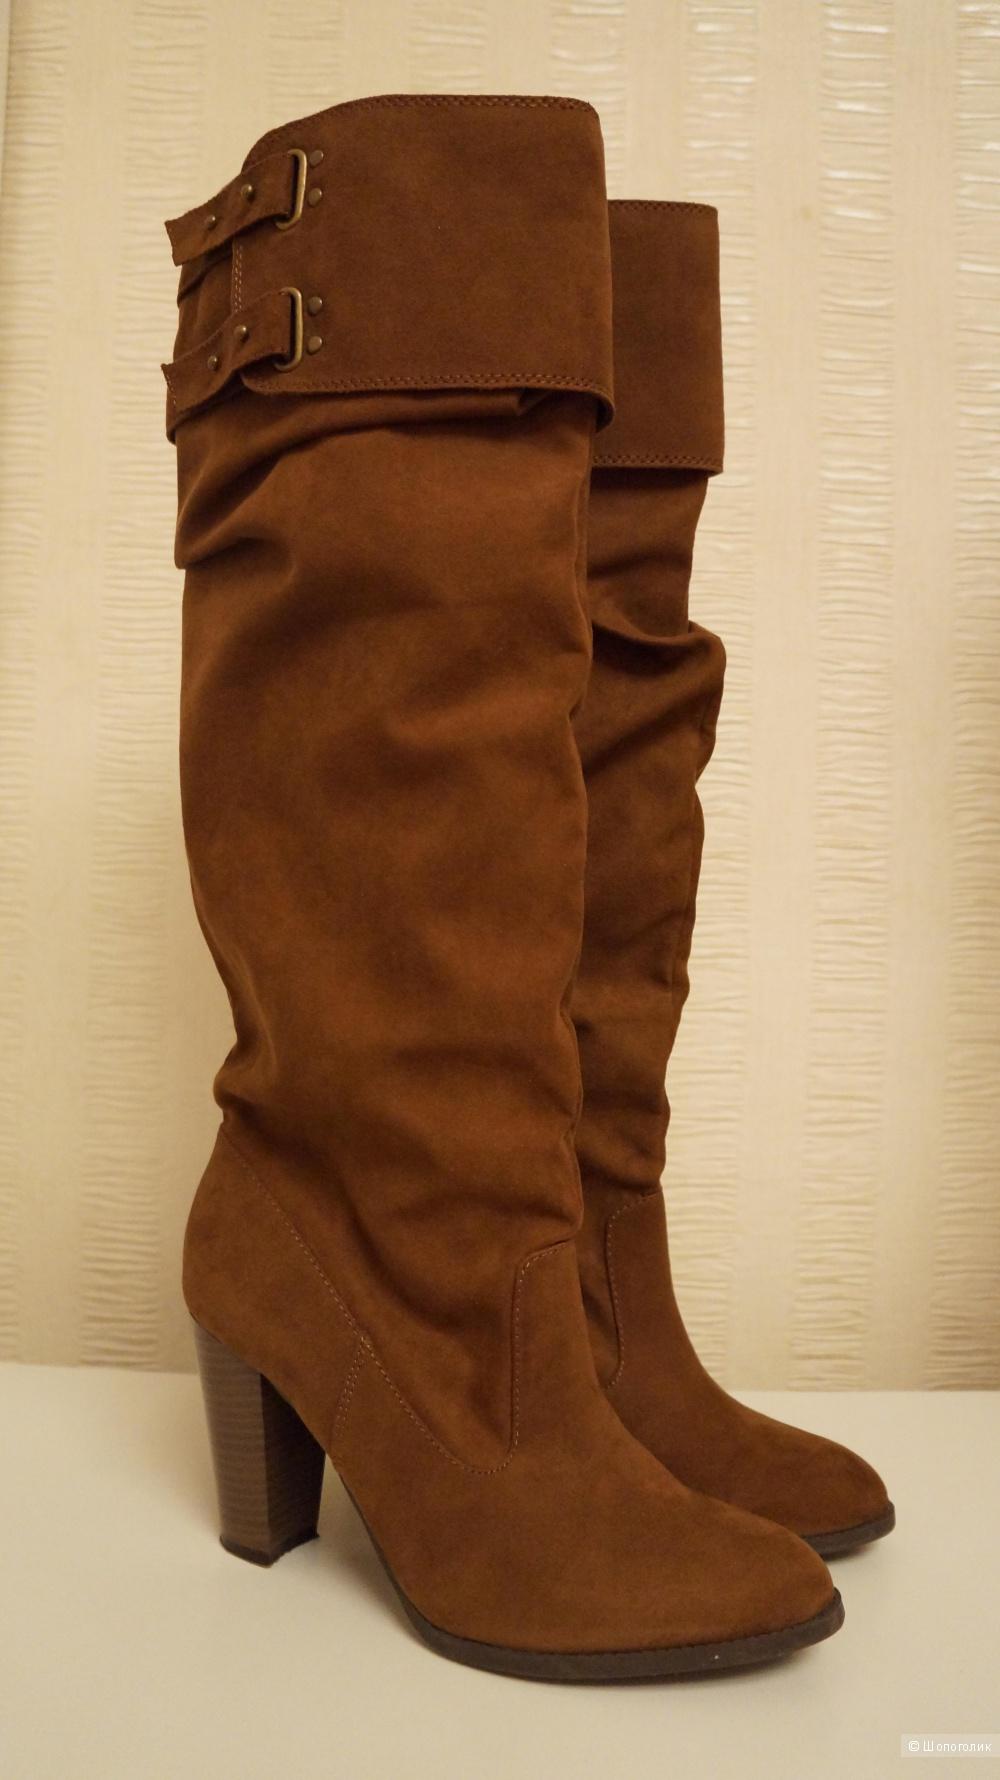 Сапоги Zara, 39 размер (40 EU)